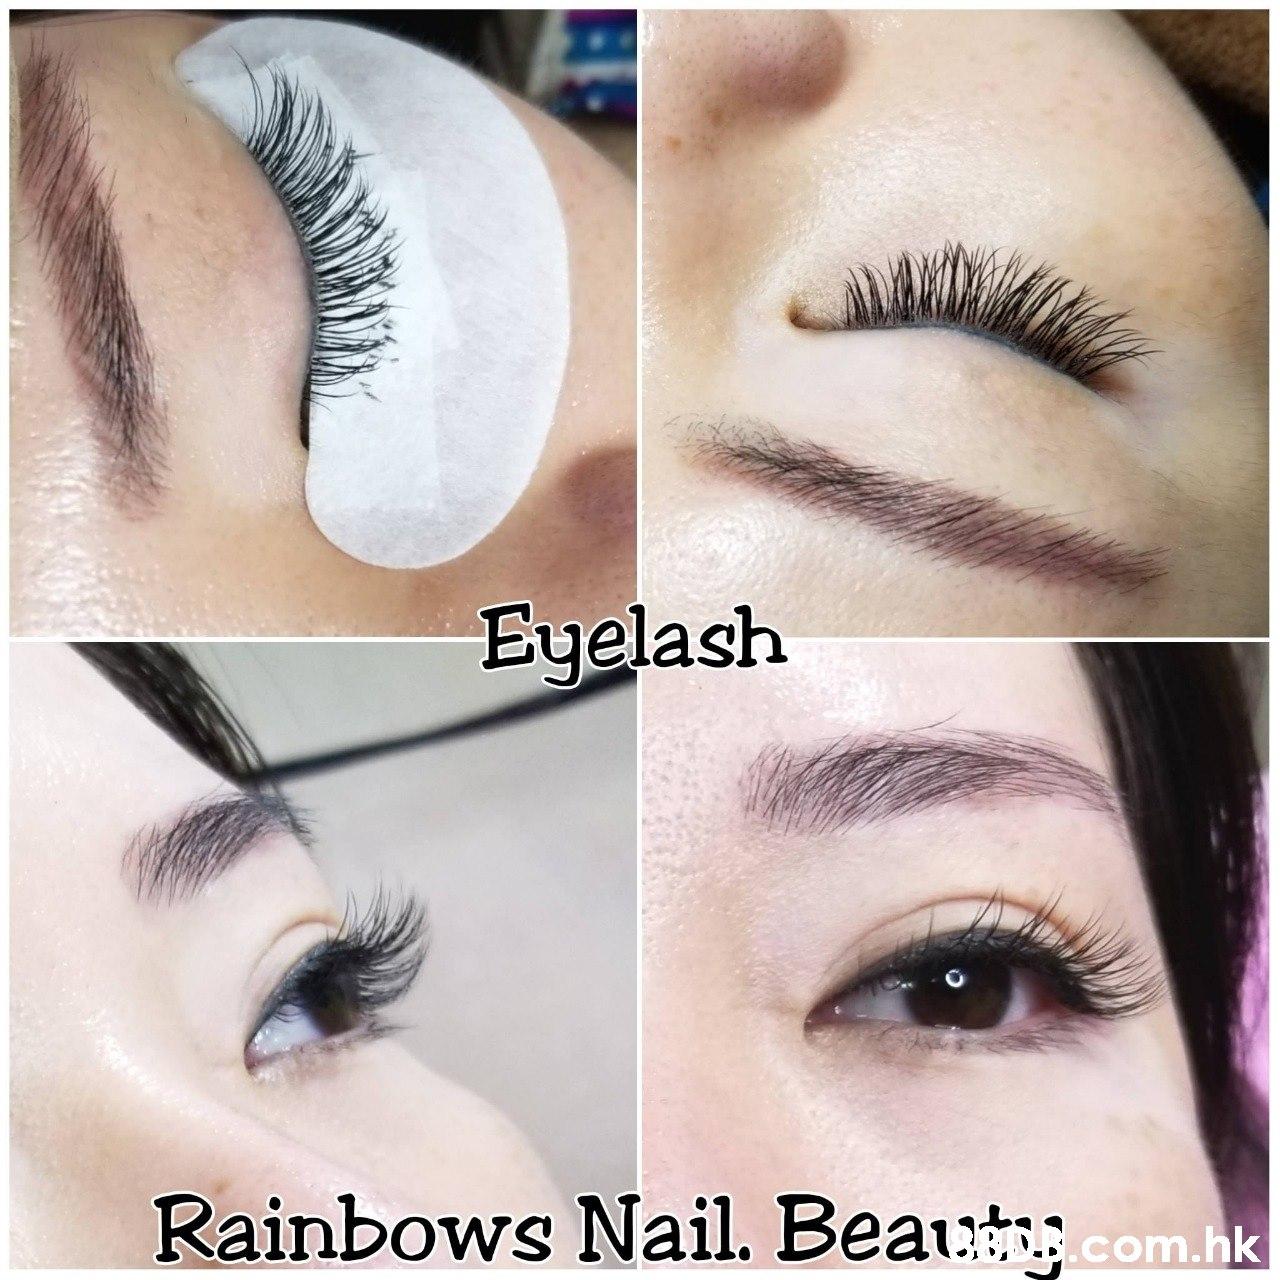 Euelash Rainbows Nail. Beau com.hk  Eyebrow,Eyelash,Eye,Skin,Eye shadow